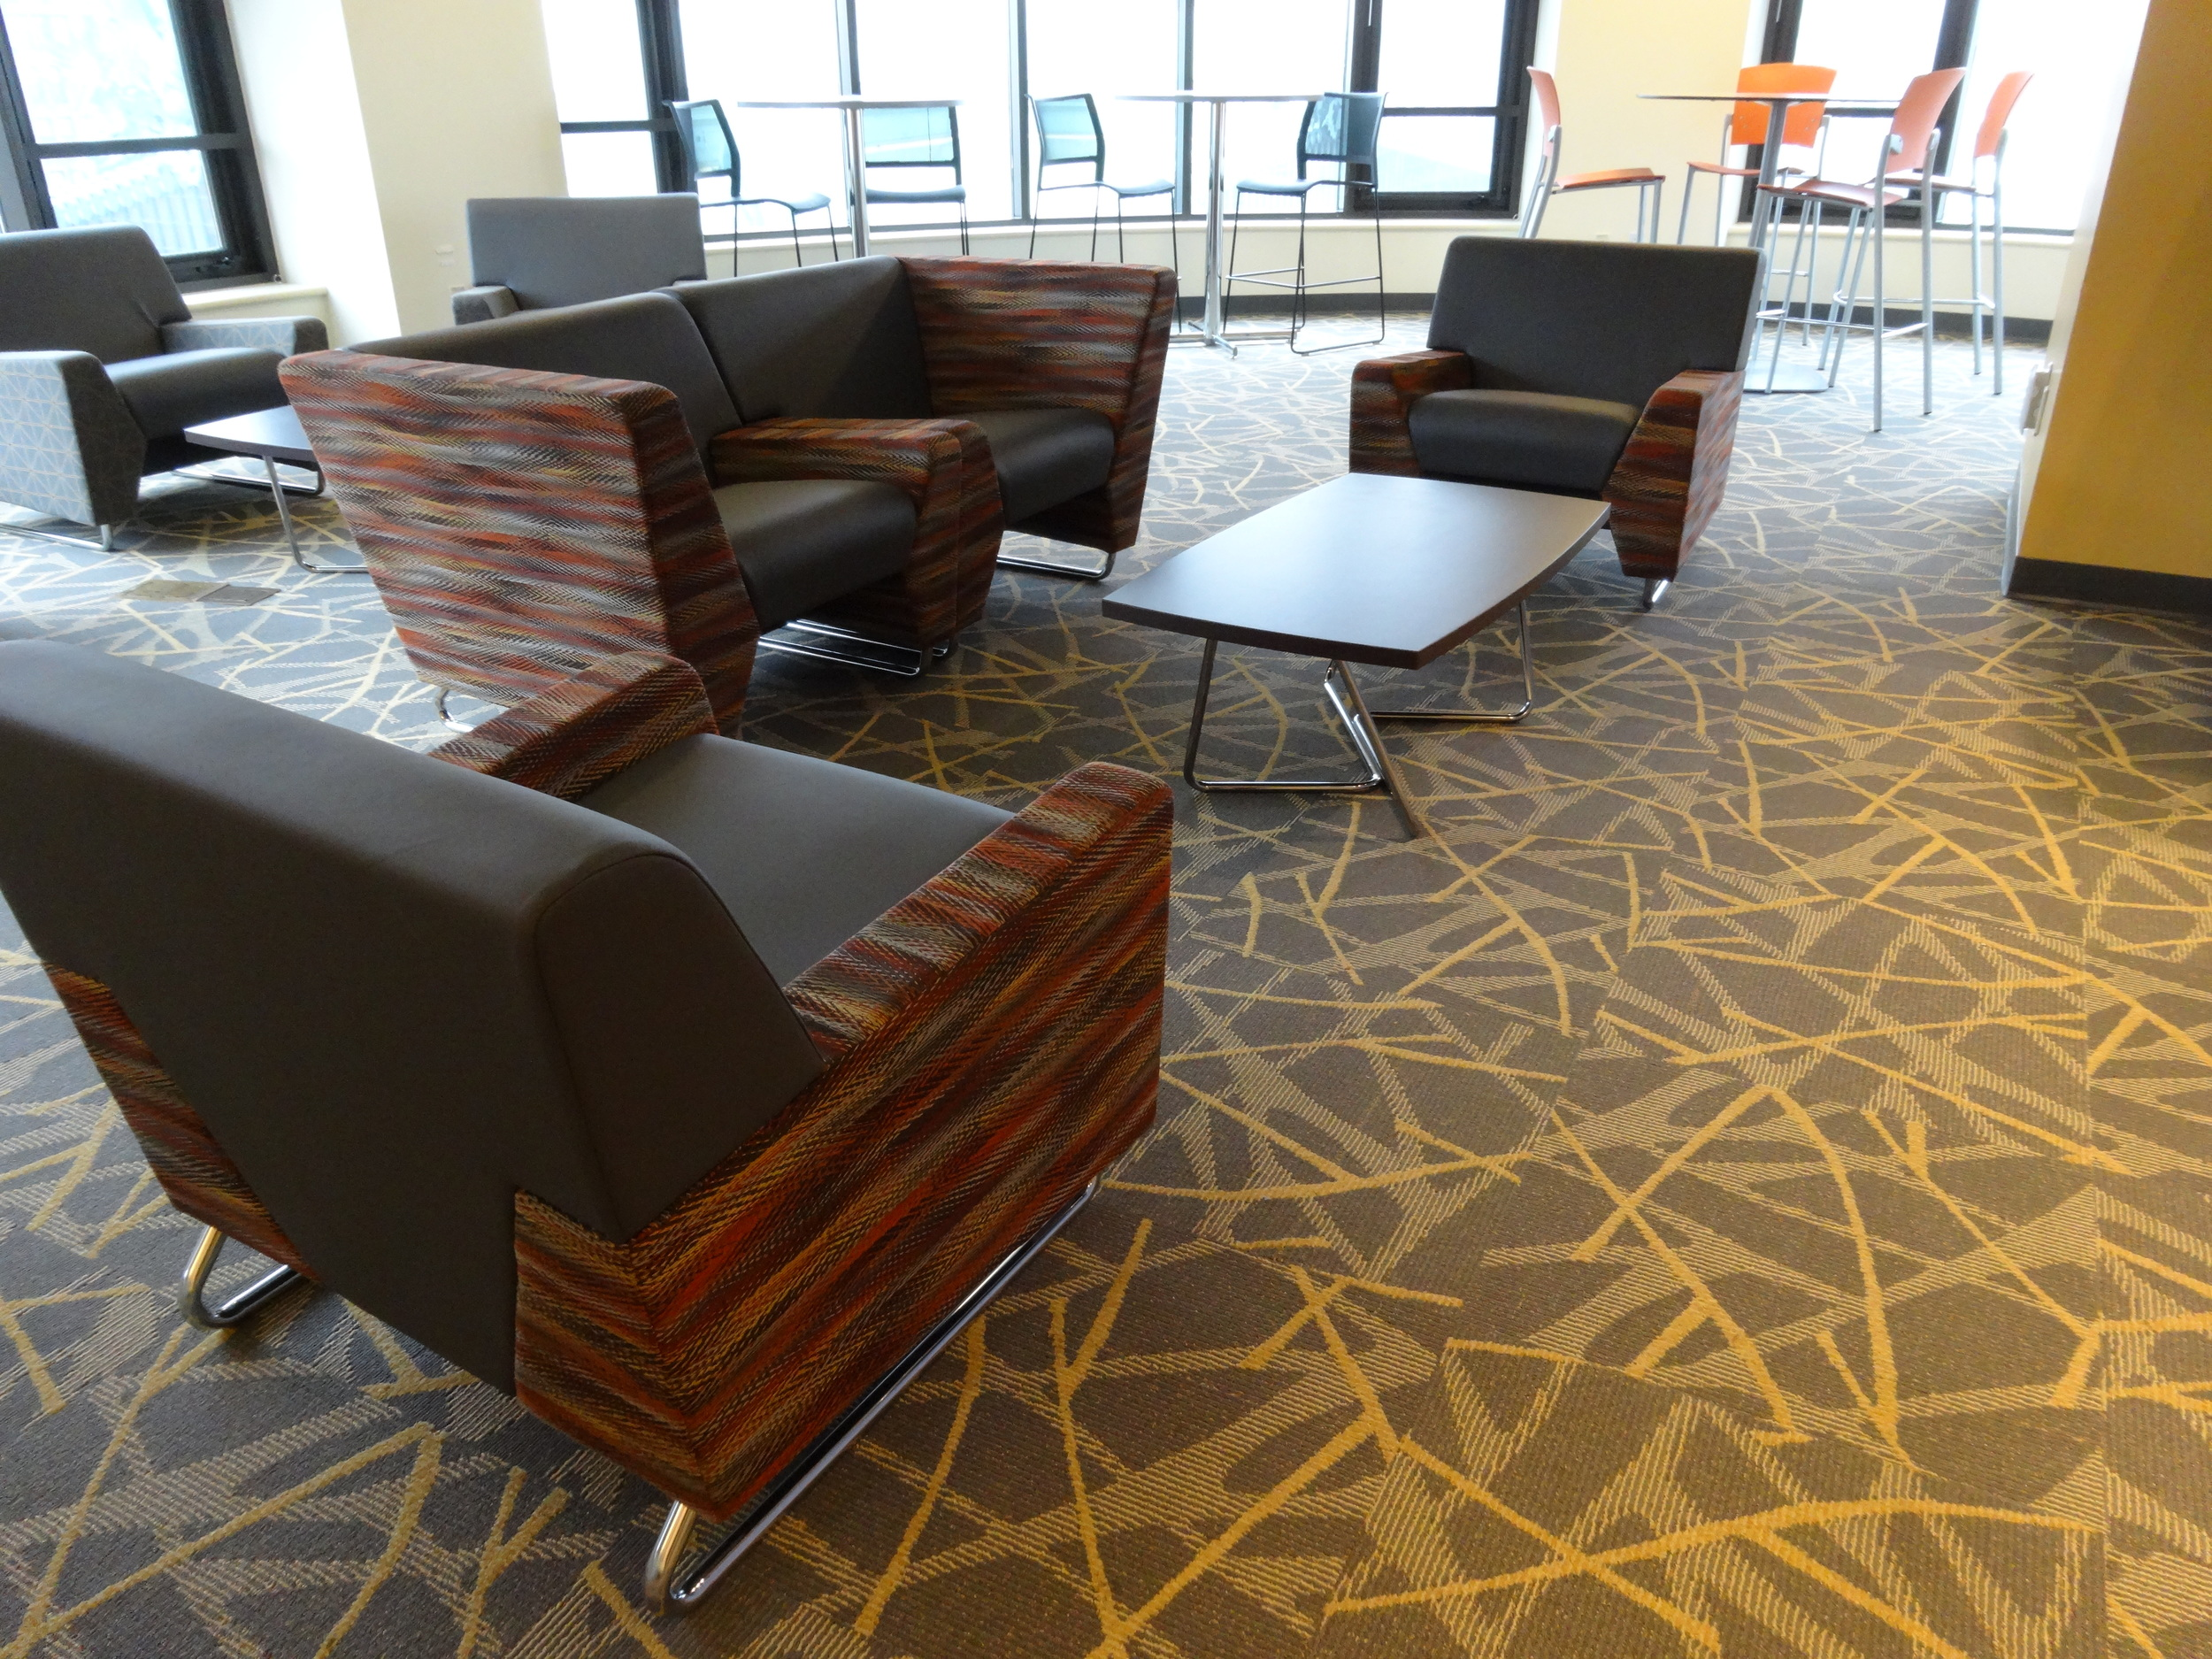 new lounge furniture 2016 008.JPG